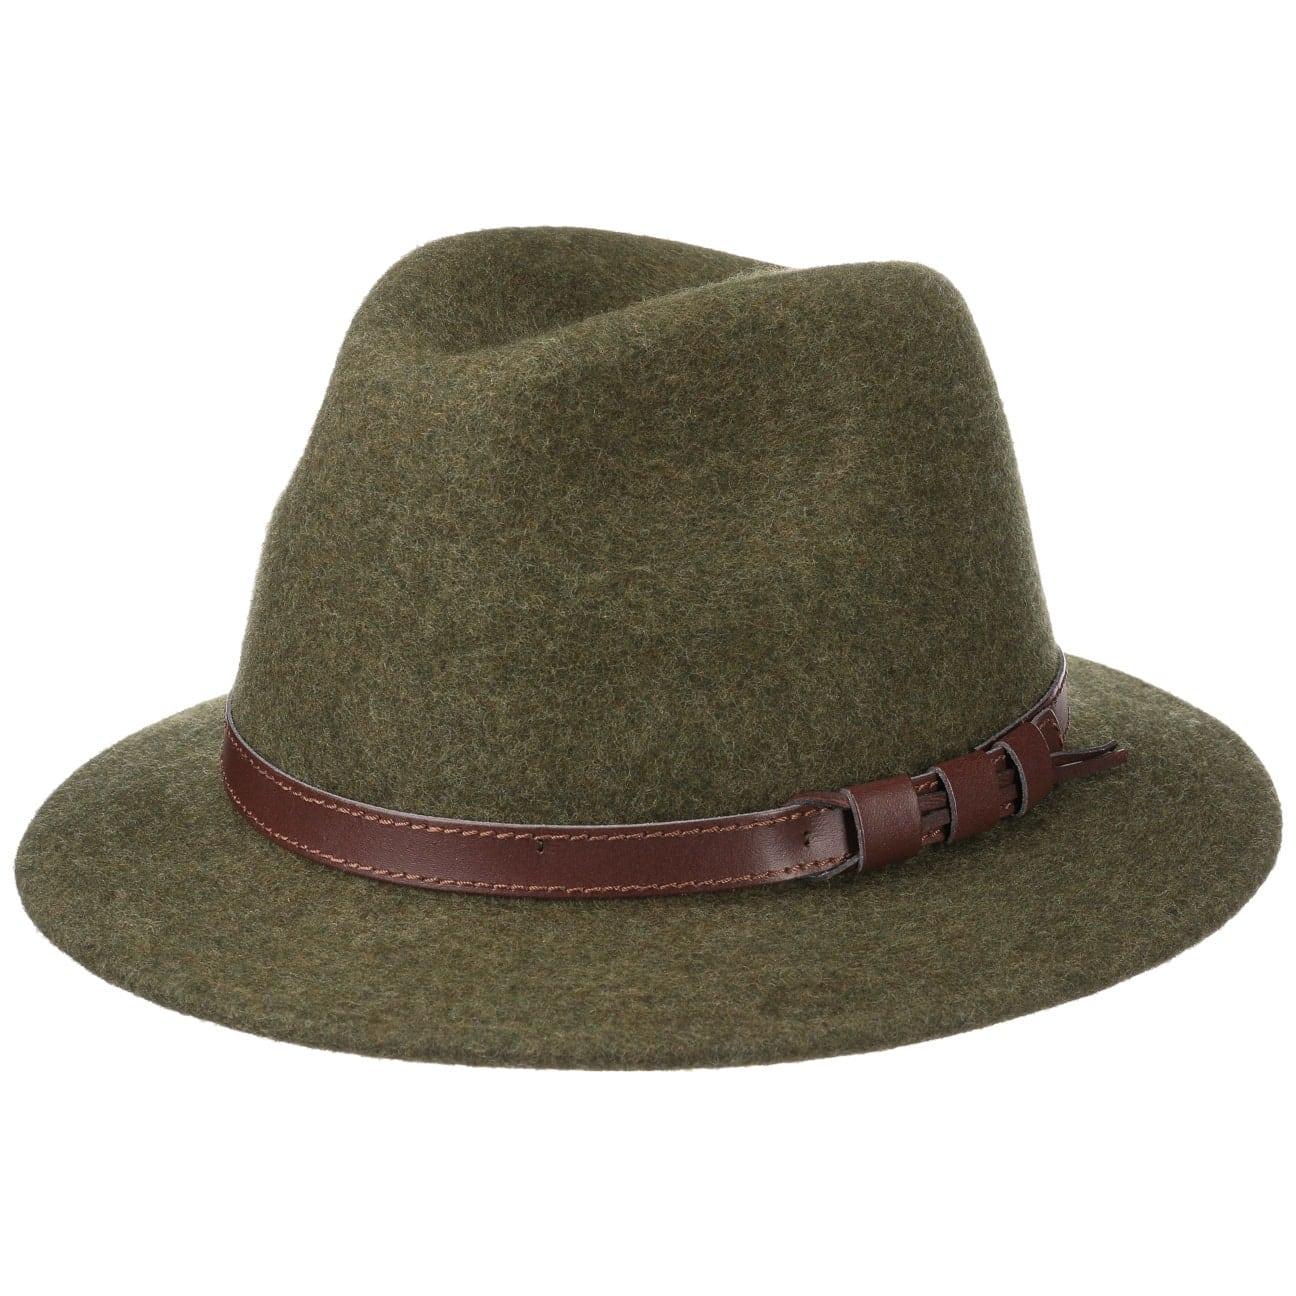 Sombrero de Lana Sauerland by Lodenhut Manufaktur